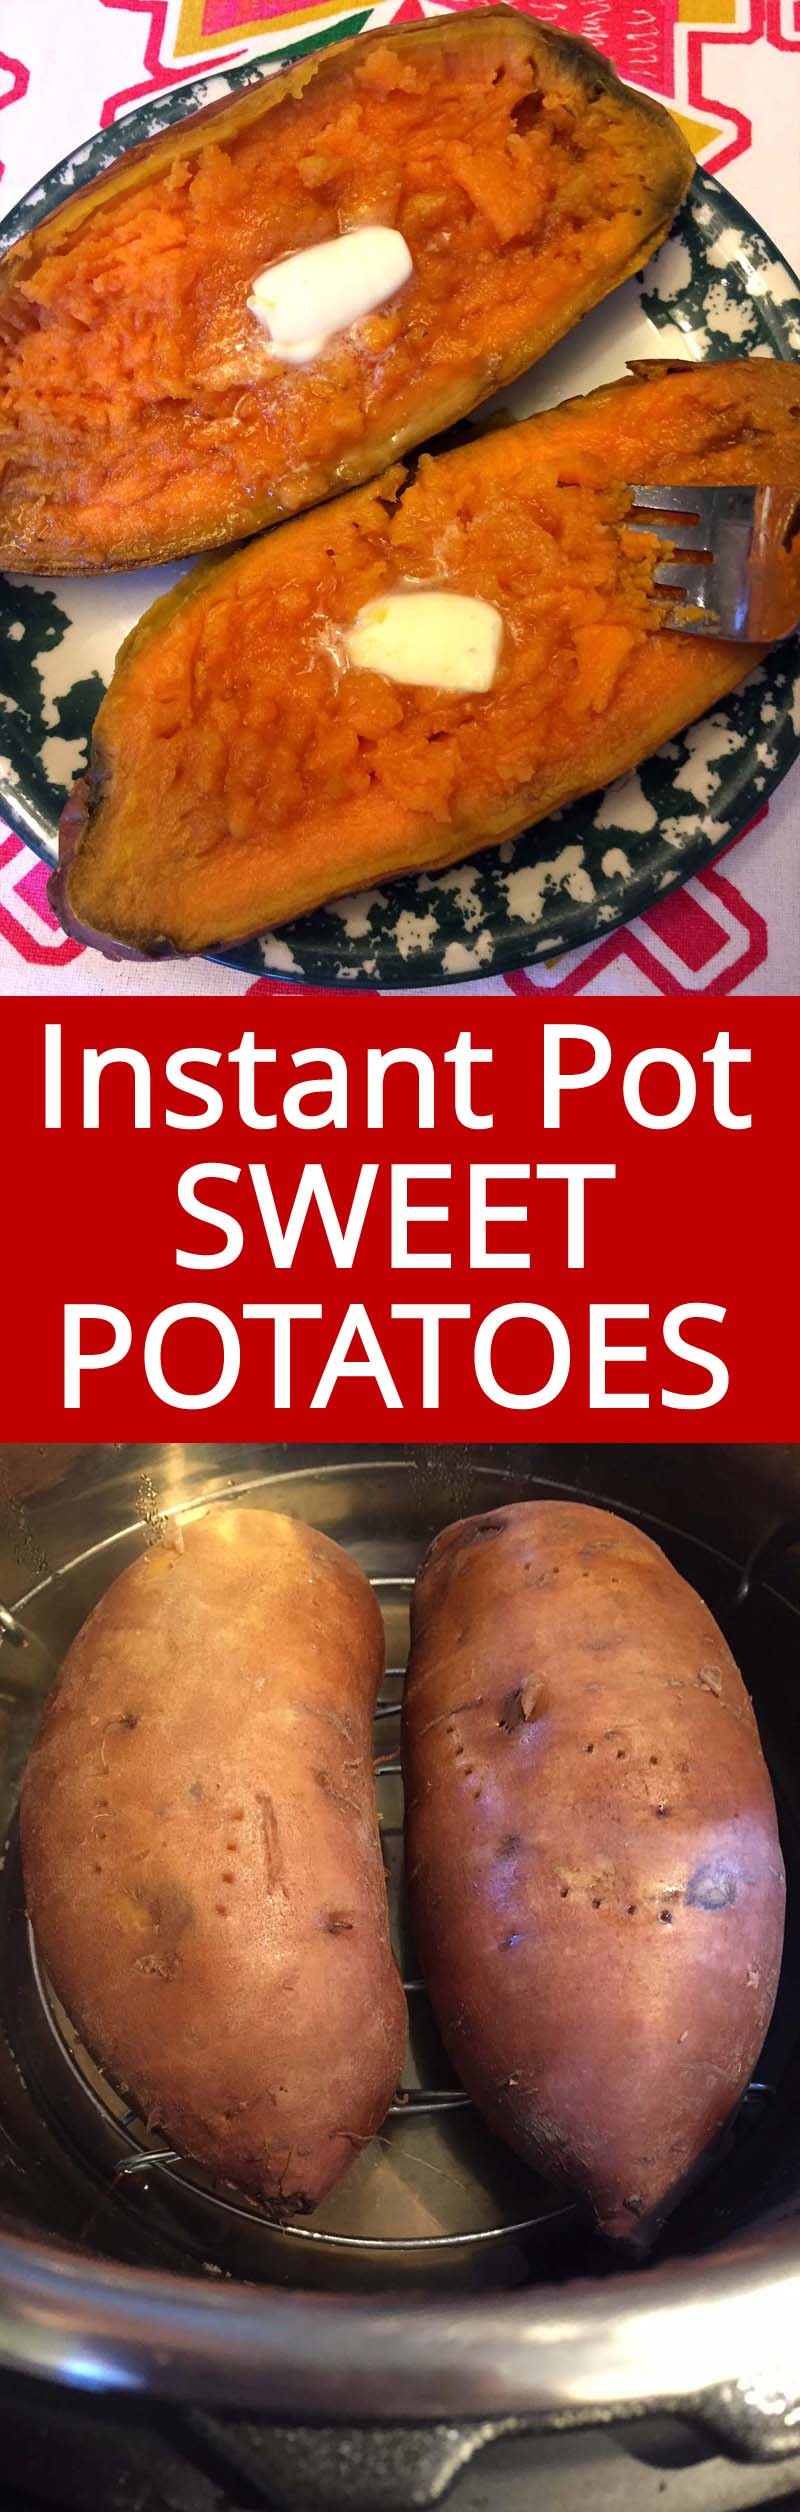 Instant Pot Baked Sweet Potato  Instant Pot Sweet Potatoes Recipe – Melanie Cooks